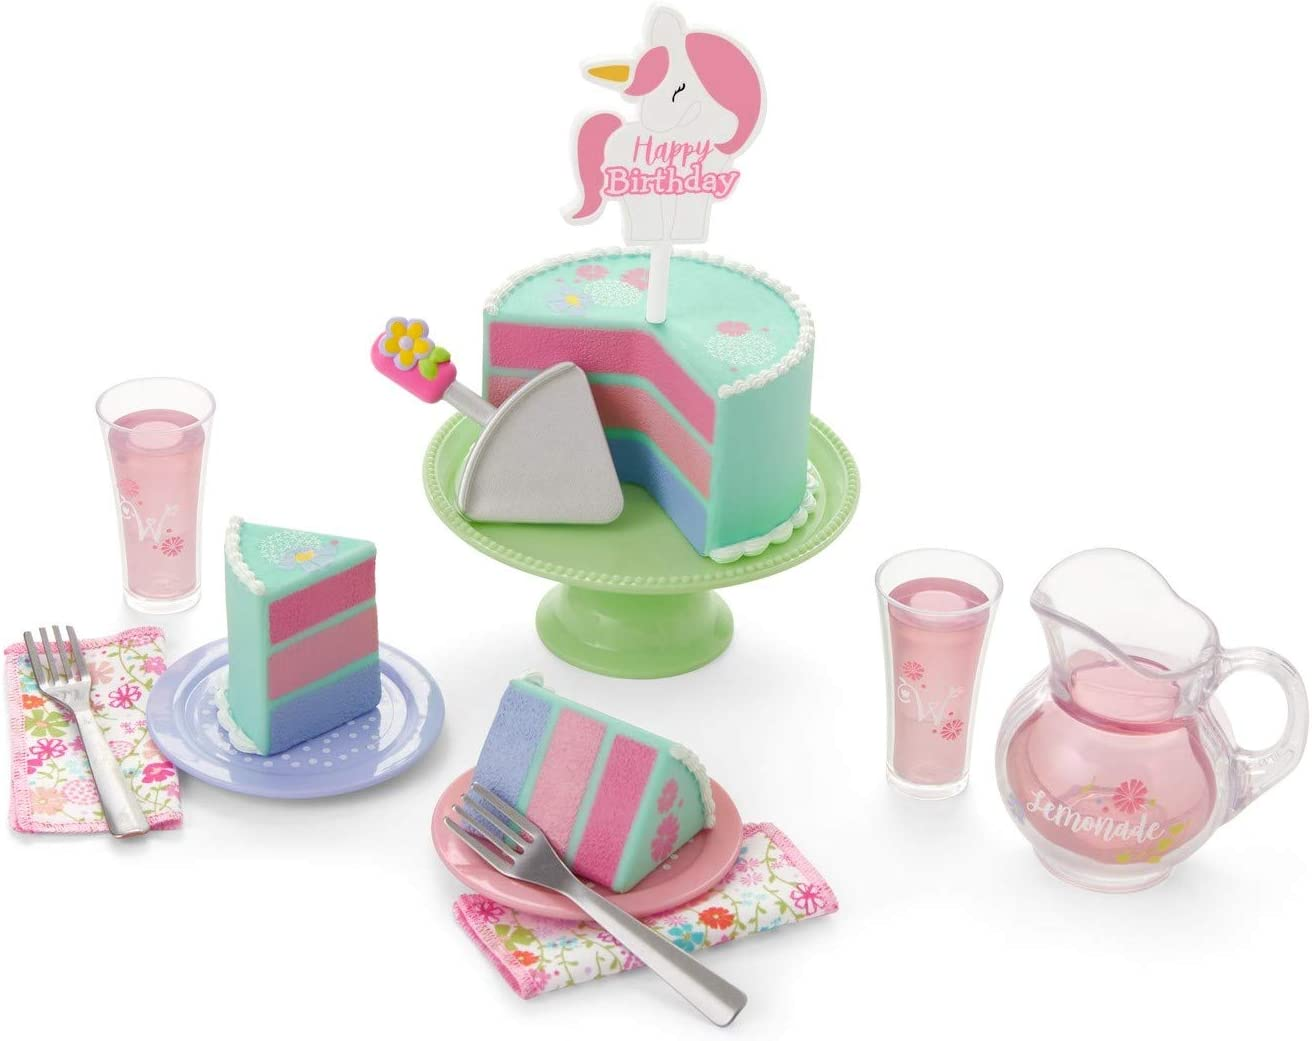 American Girl WellieWishers Birthday Treat Set for 14.5